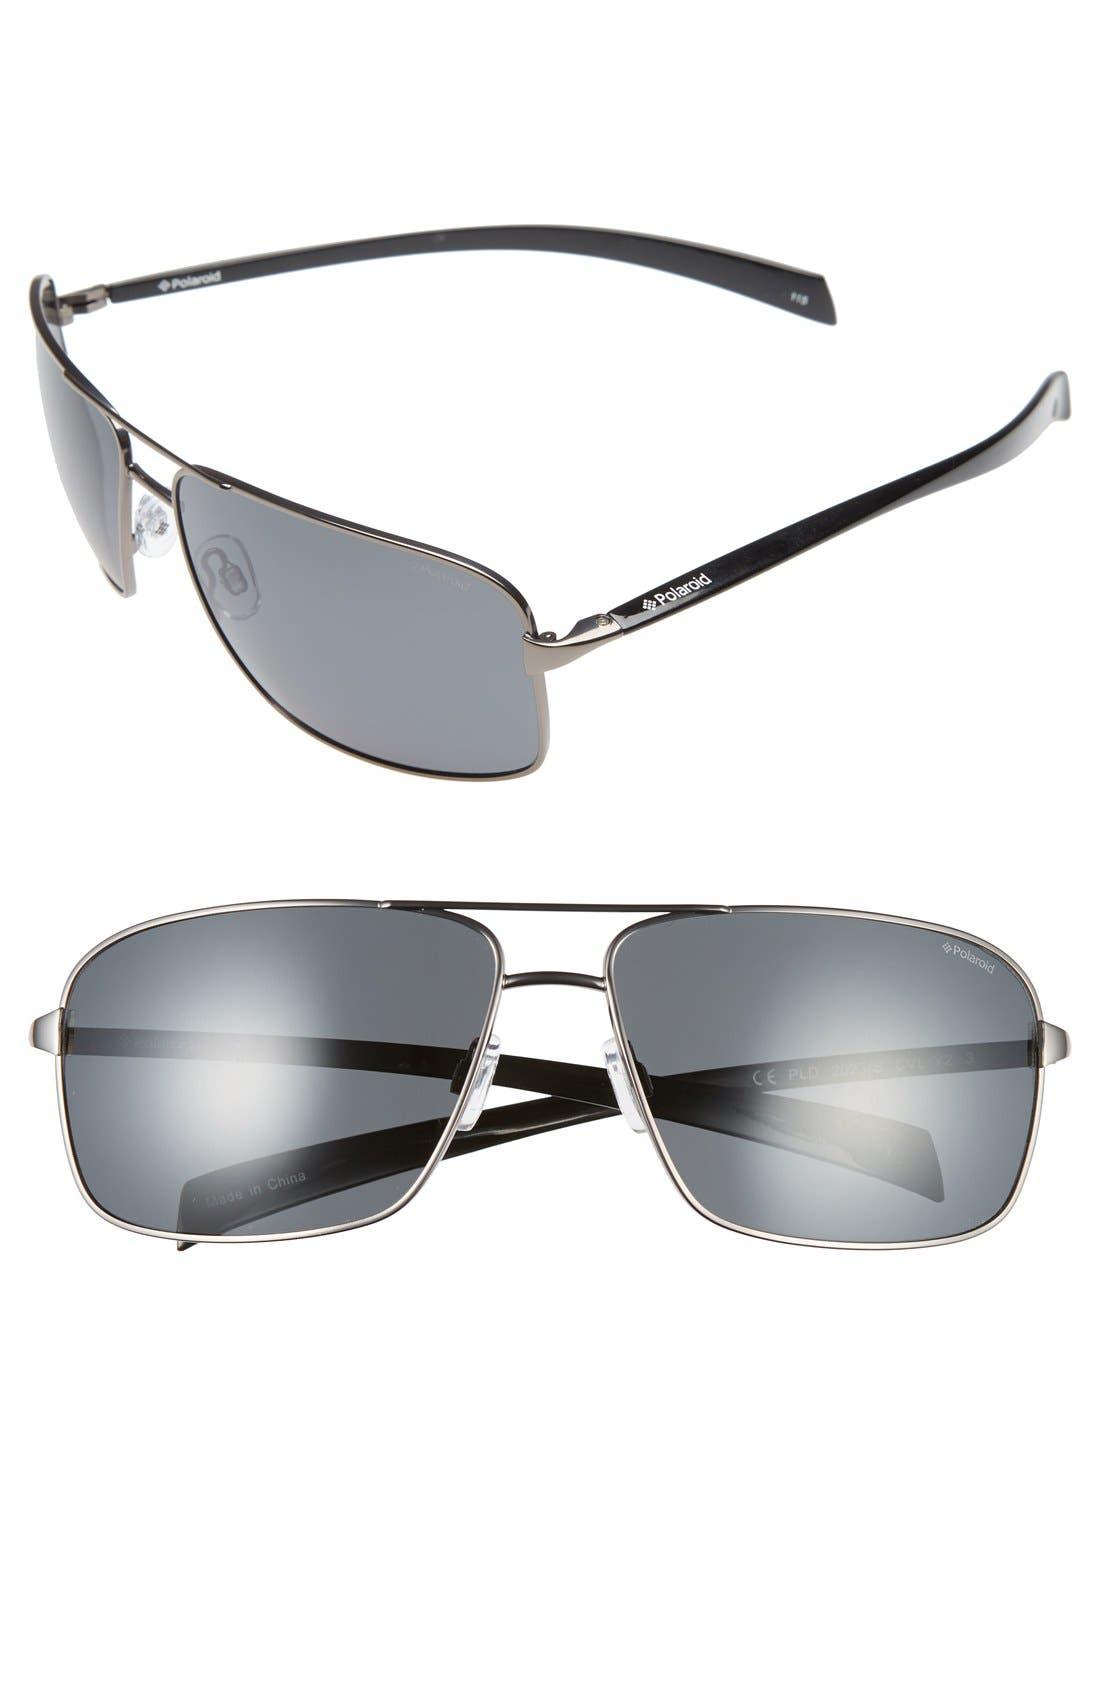 POLAROID EYEWEAR 64mm Polarized Aviator Sunglasses